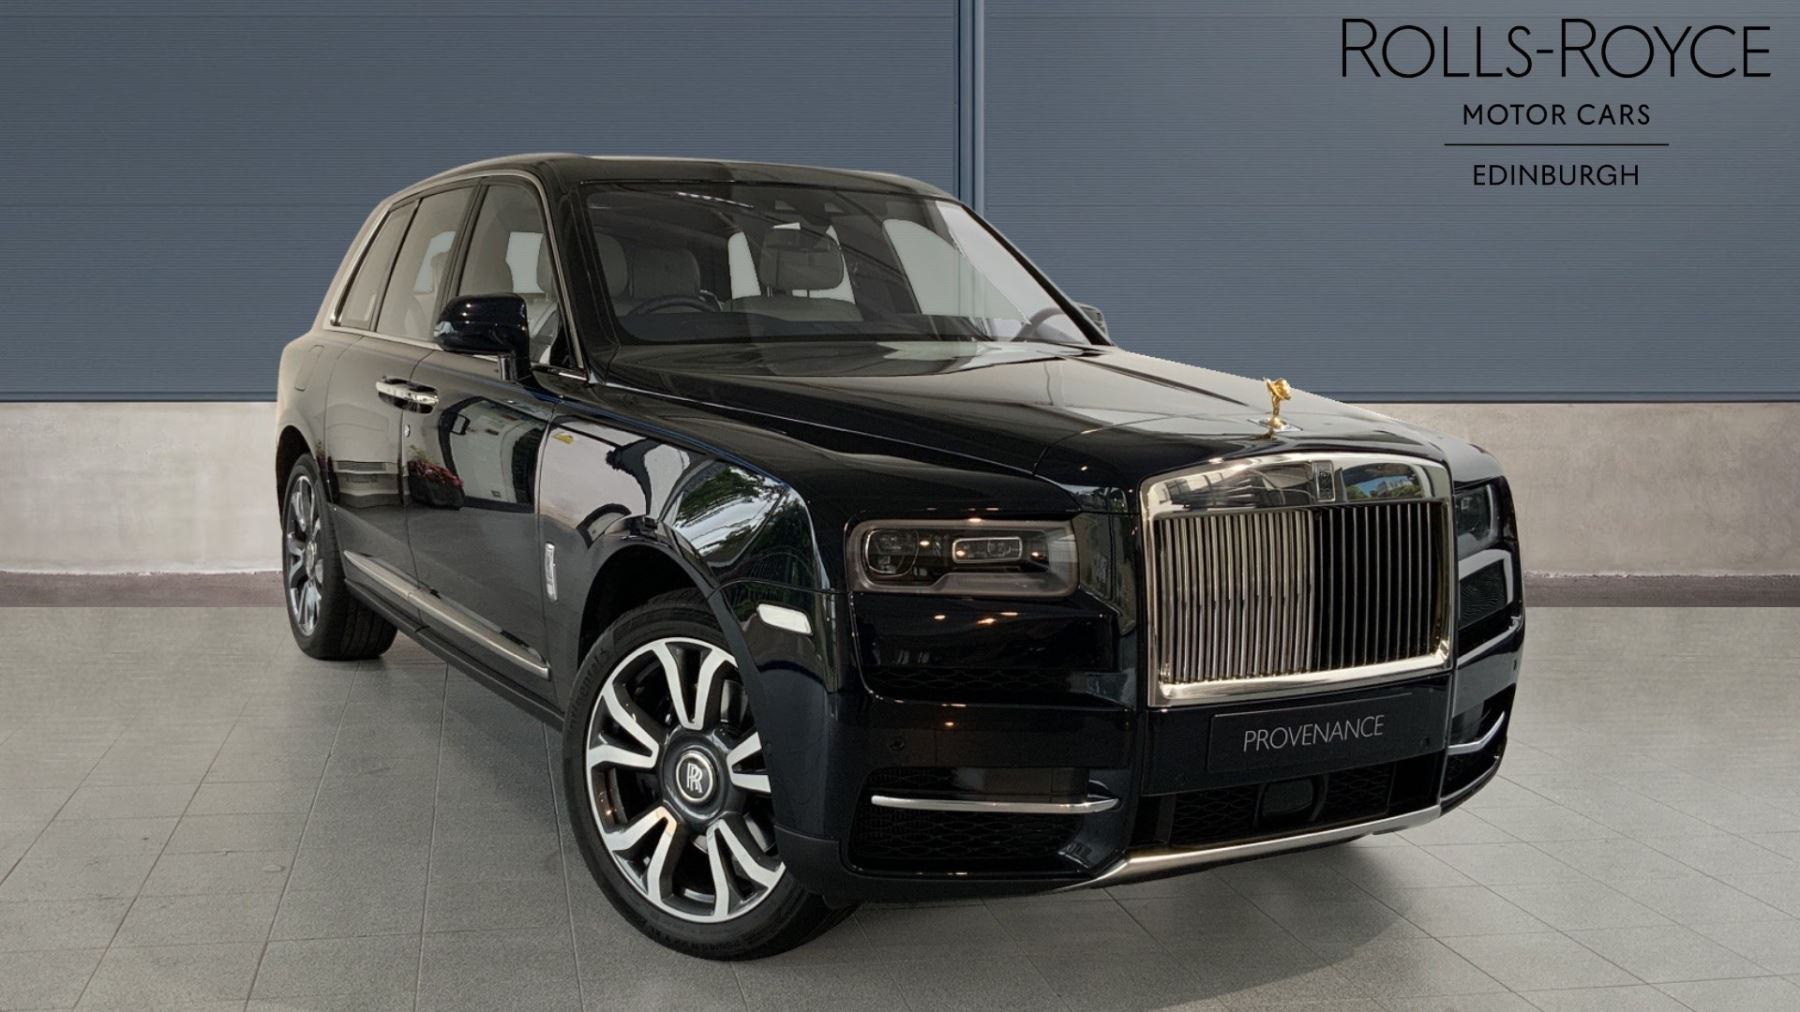 Rolls-Royce Cullinan V12 - Rear Theatre - Champagne Cooler - Golden SOE 6.6 Automatic 4 door 4x4 (2018)